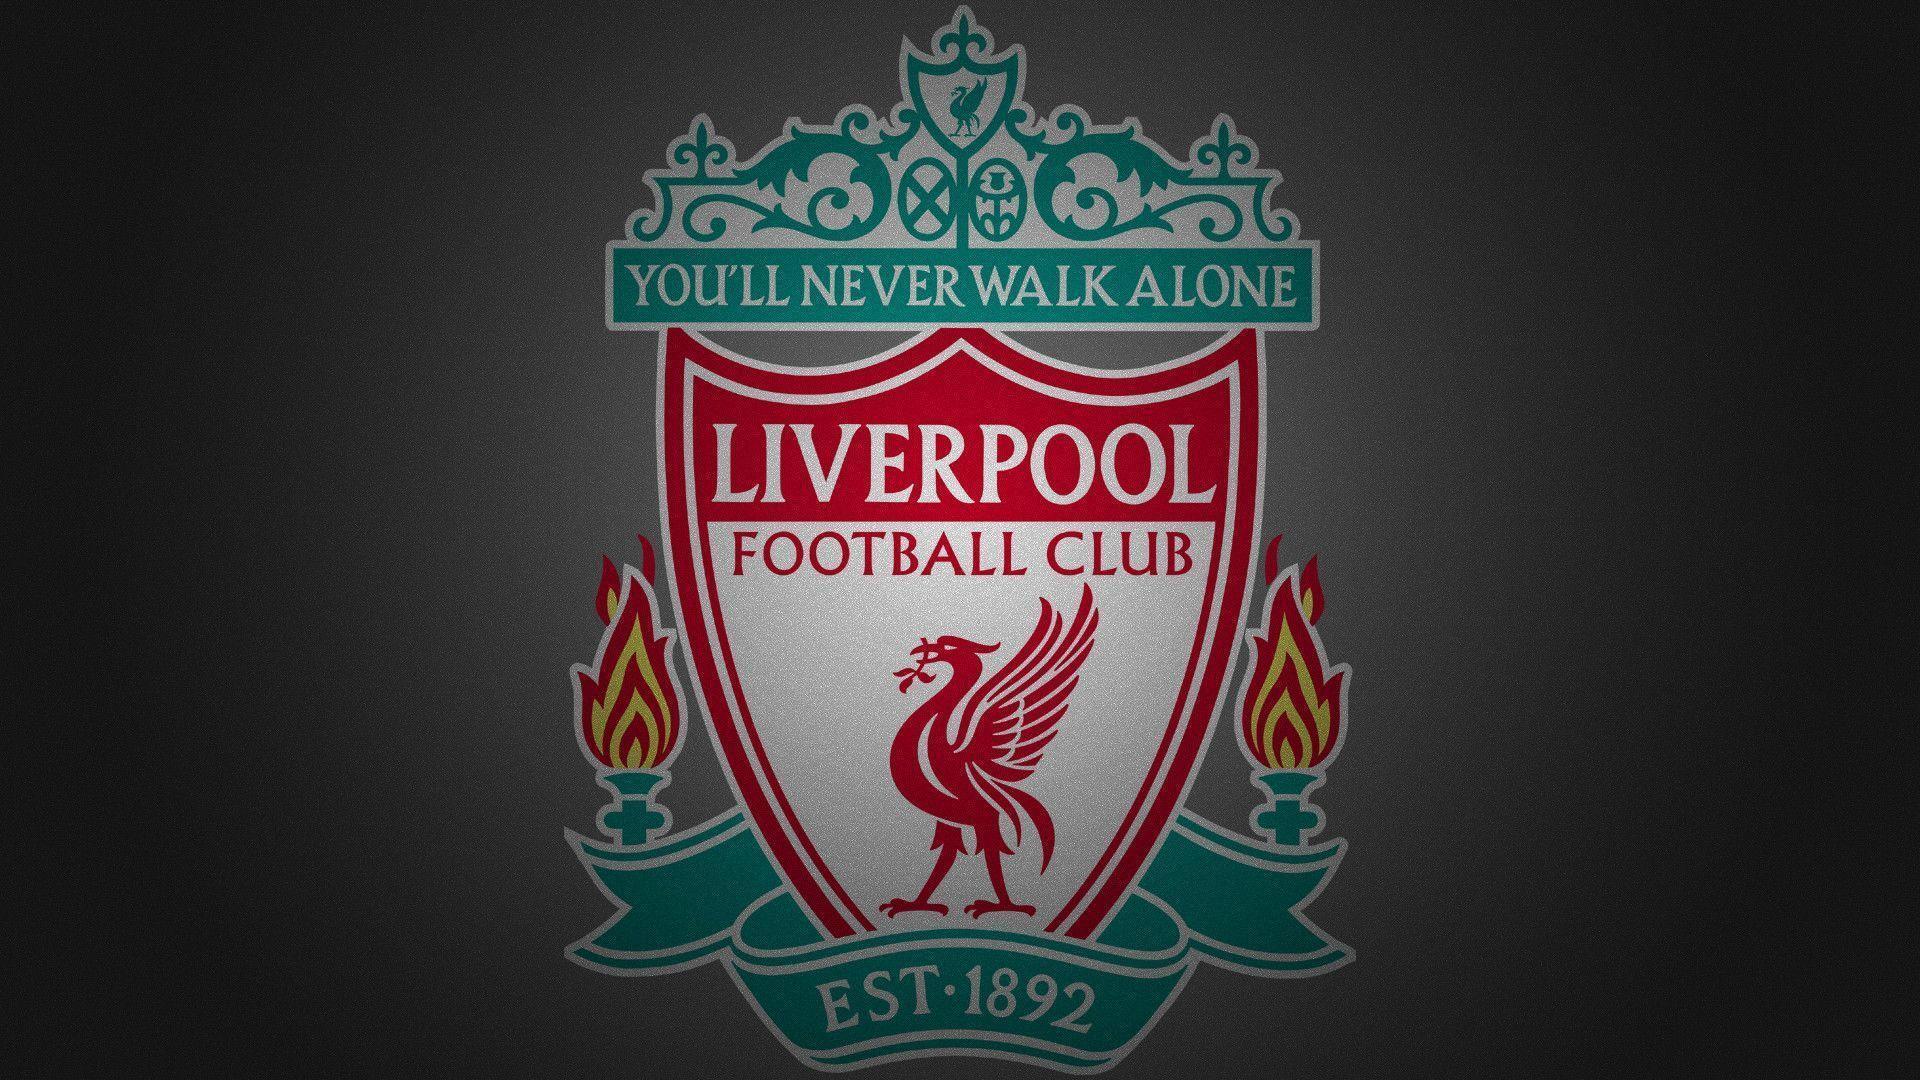 Liverpool LFC Logo Wallpaper Android   Bulk HD Wallpapers. Liverpool F C Wallpapers   Wallpaper Cave